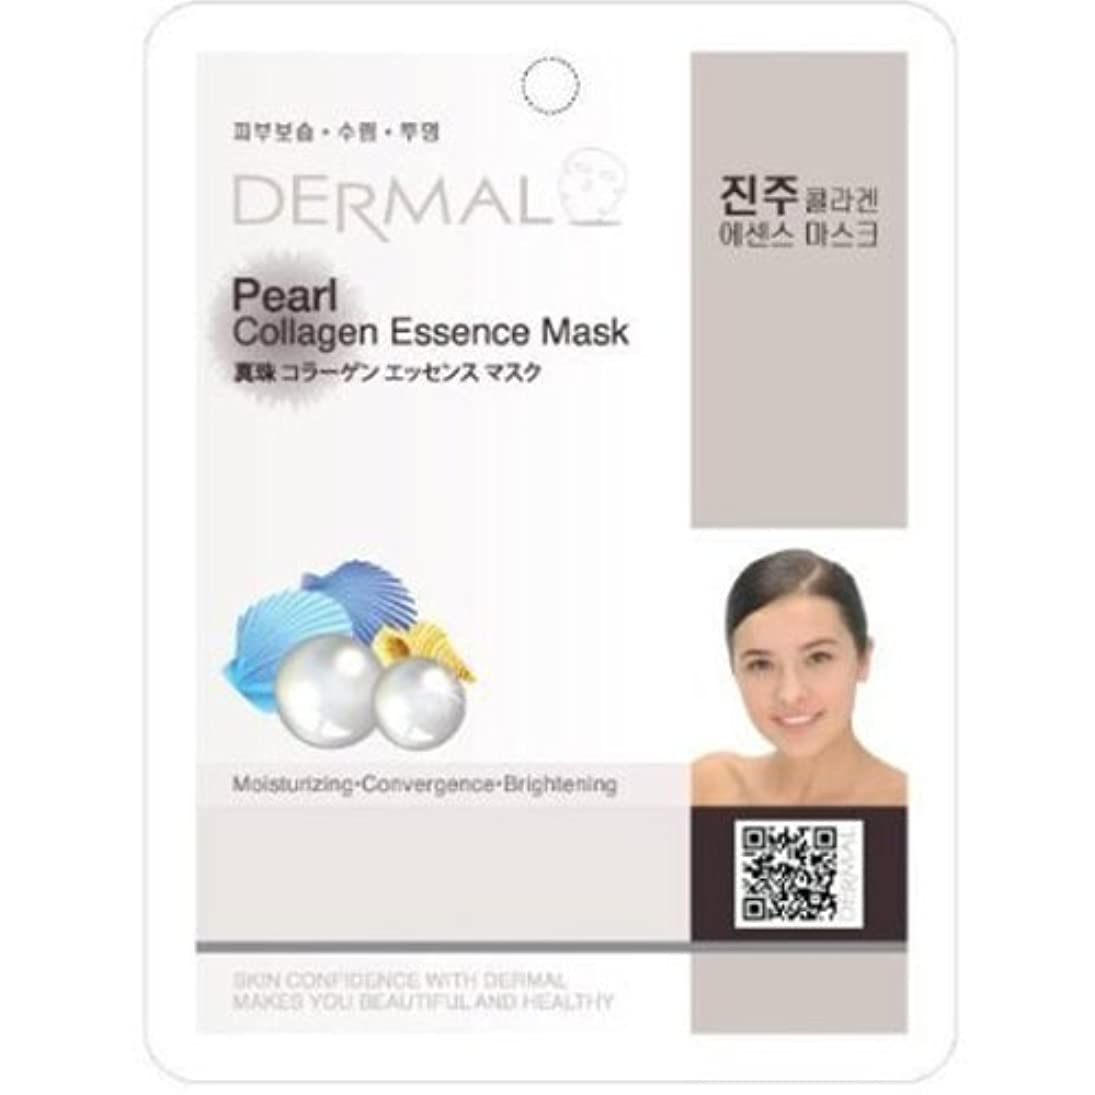 【DERMAL】ダーマル シートマスク 真珠 10枚セット/保湿/フェイスマスク/フェイスパック/マスクパック/韓国コスメ [メール便]